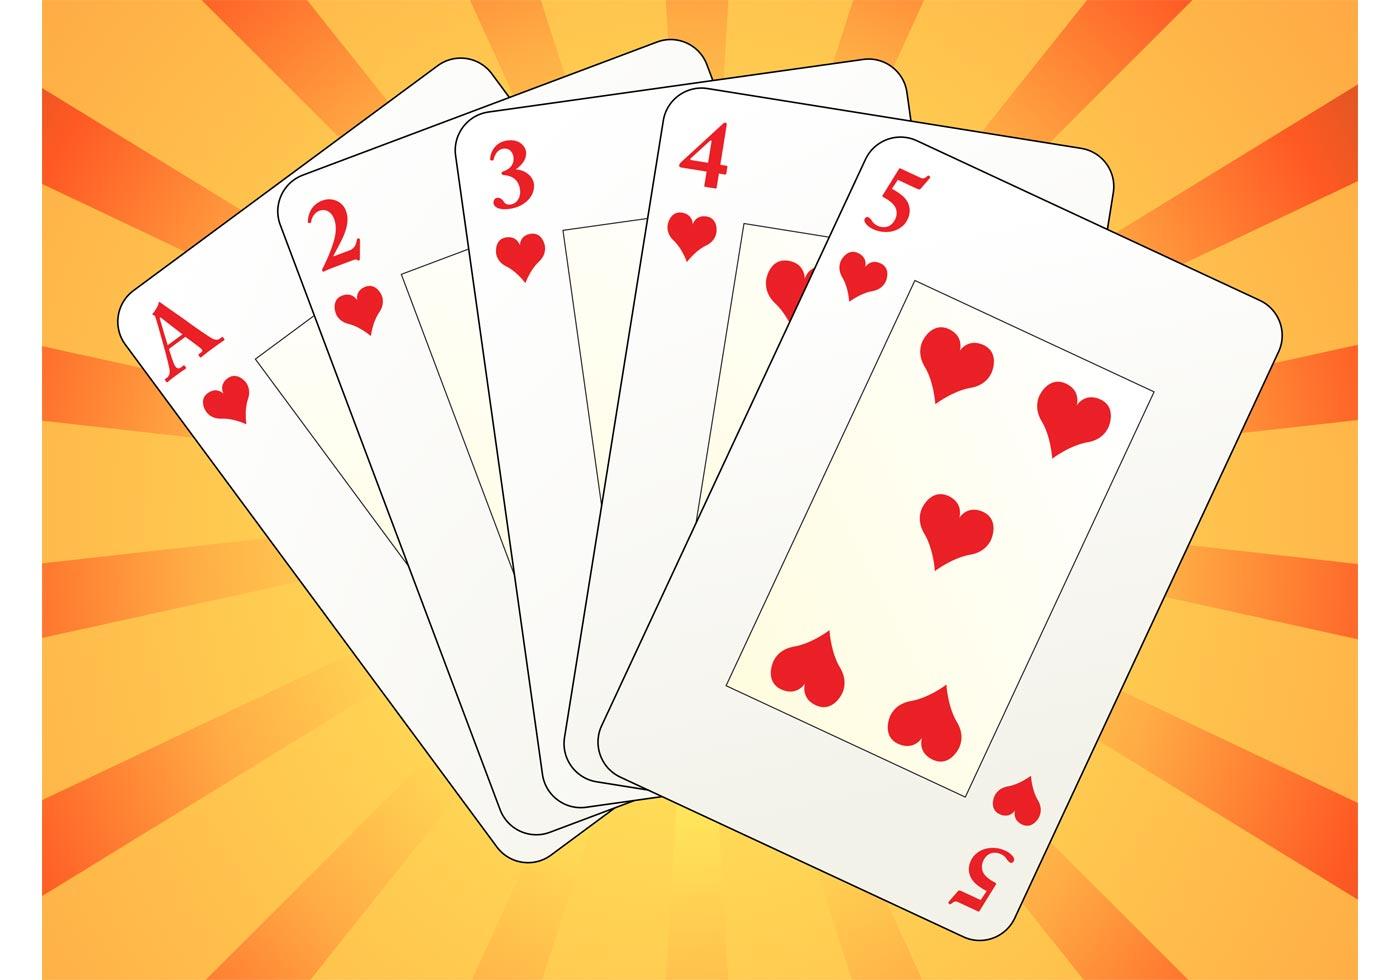 Casino royale poker chips 10